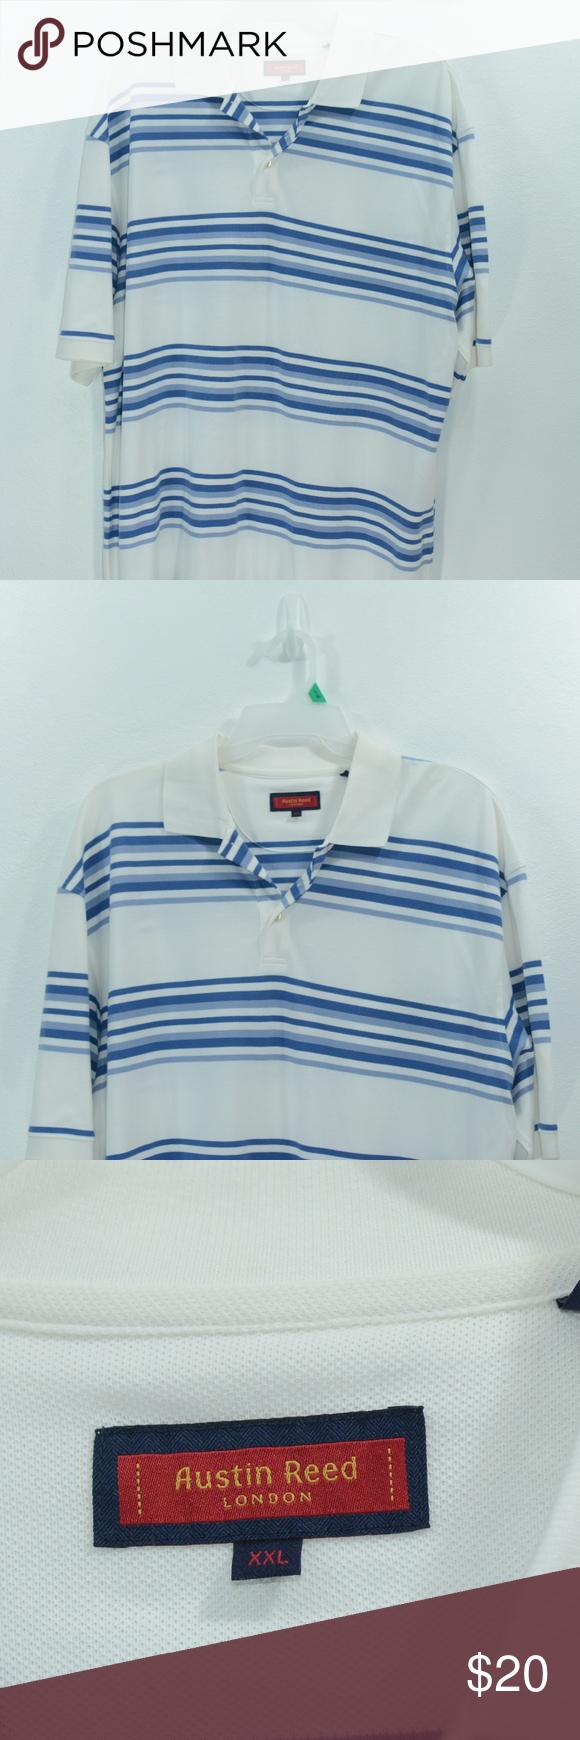 Austin Reed London Mens Polo Shirt White Blue Xxl Nwt 100 Cotton Approximate Measurements Waist 28 Inches Polo Shirt White Shirts White Men S Polo Shirt